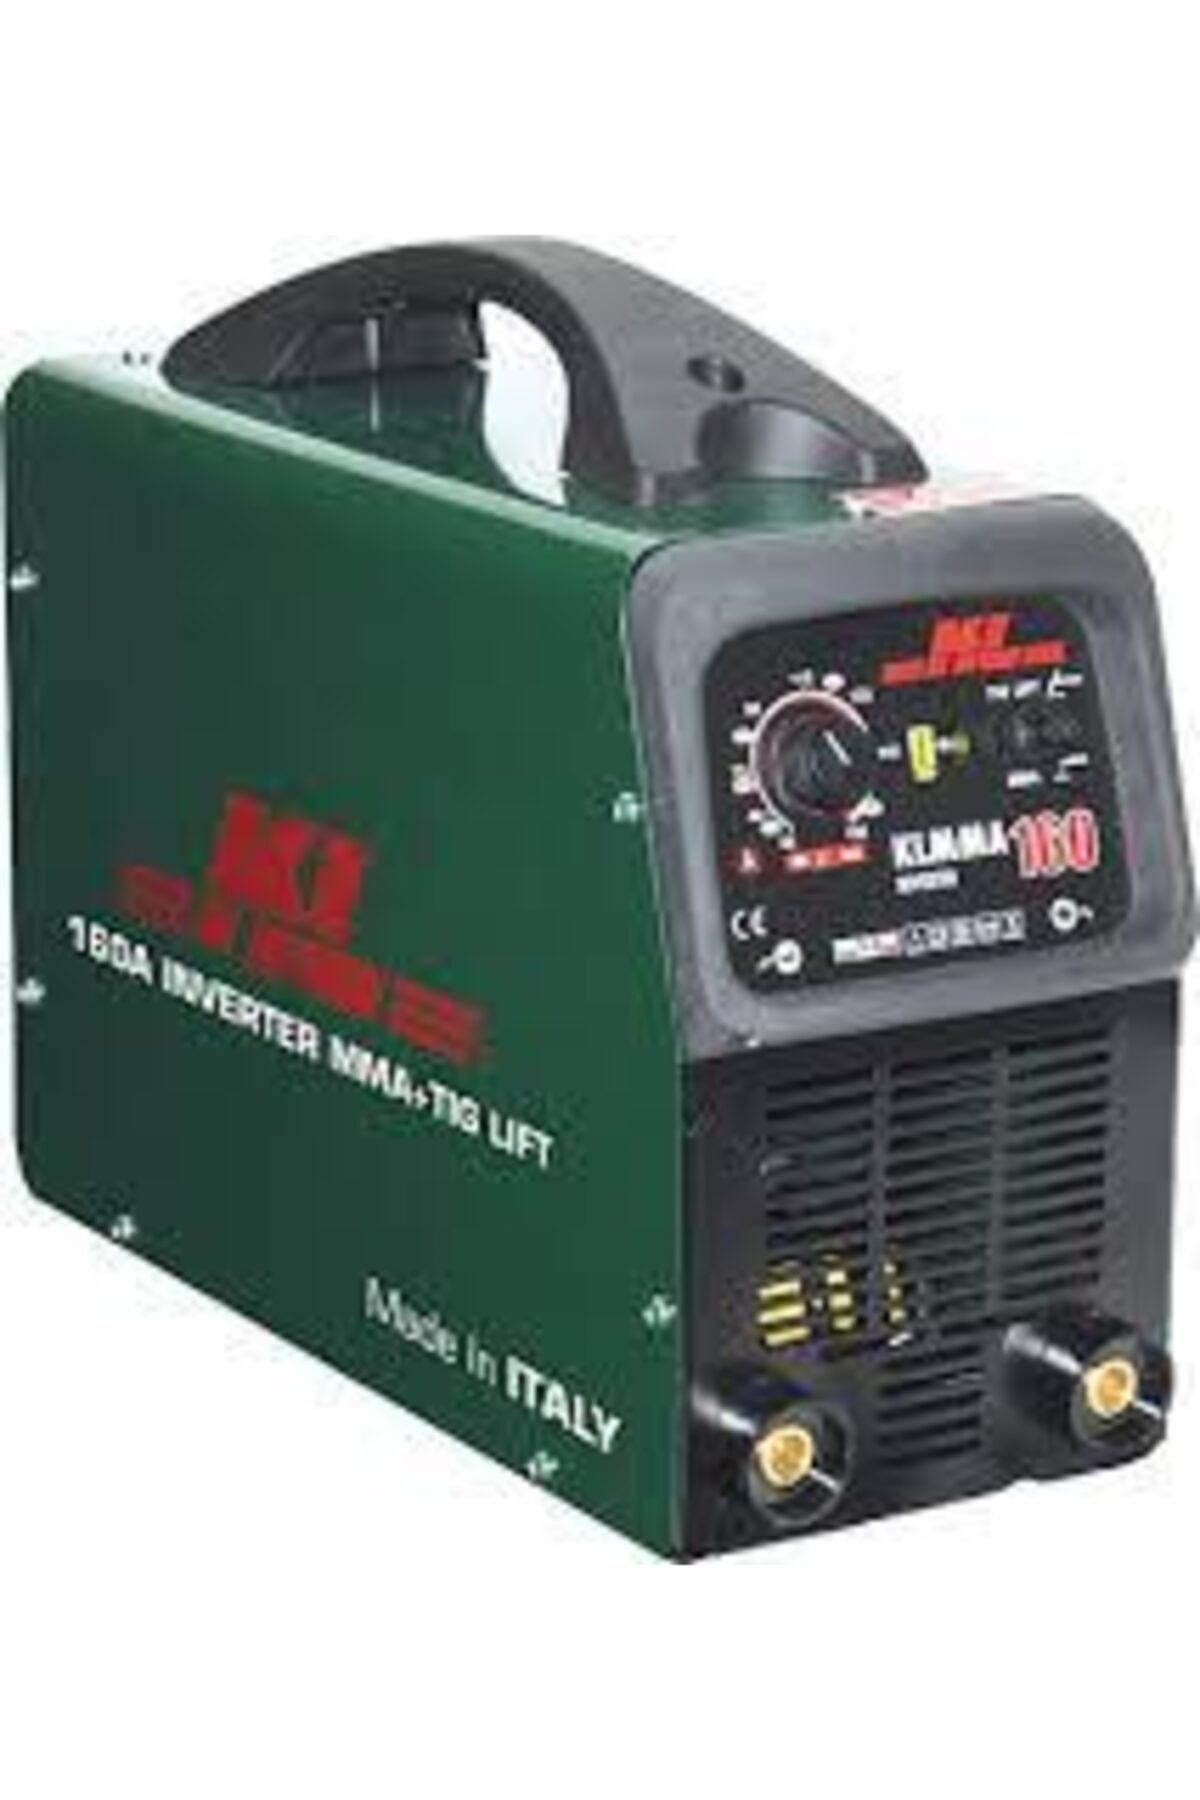 KLPRO Kale Klmma160 160 Amper Inverter Kaynak Makinesi 1